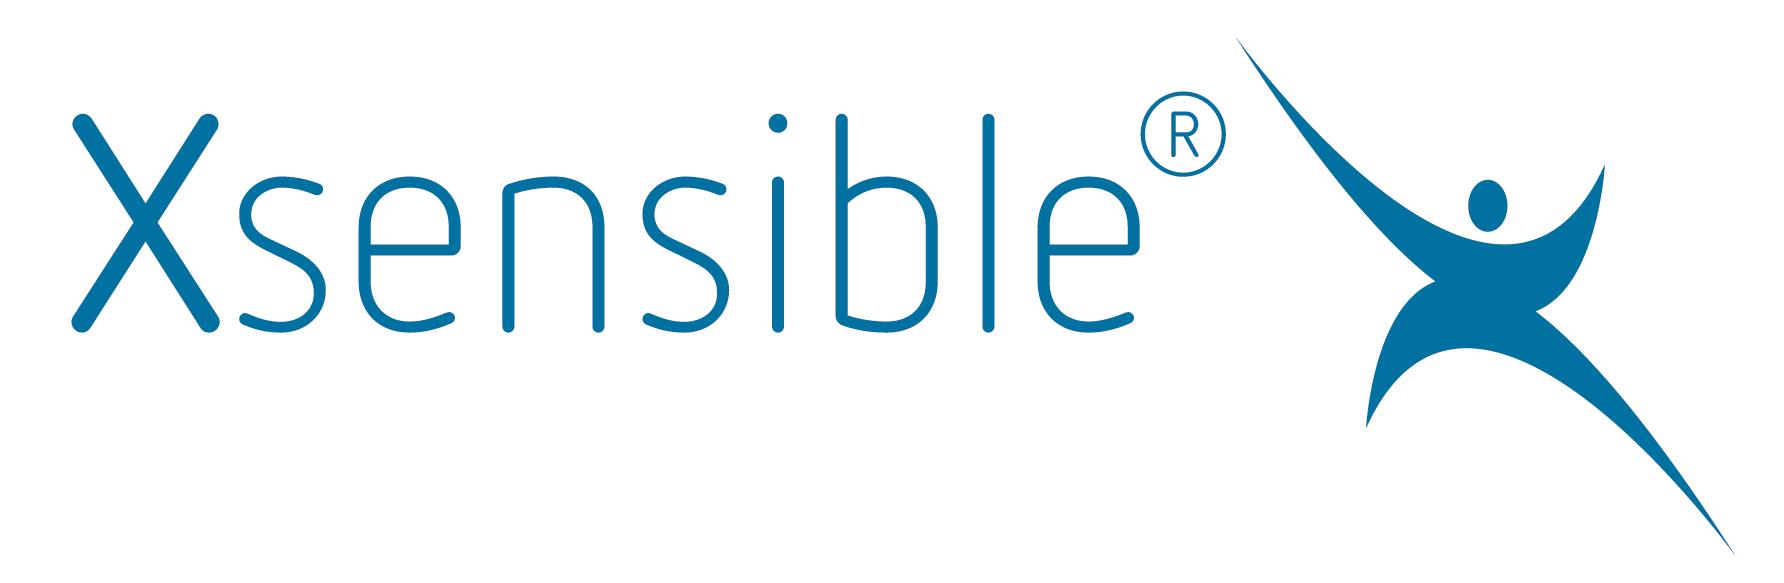 happy-walker-xsensible-logo